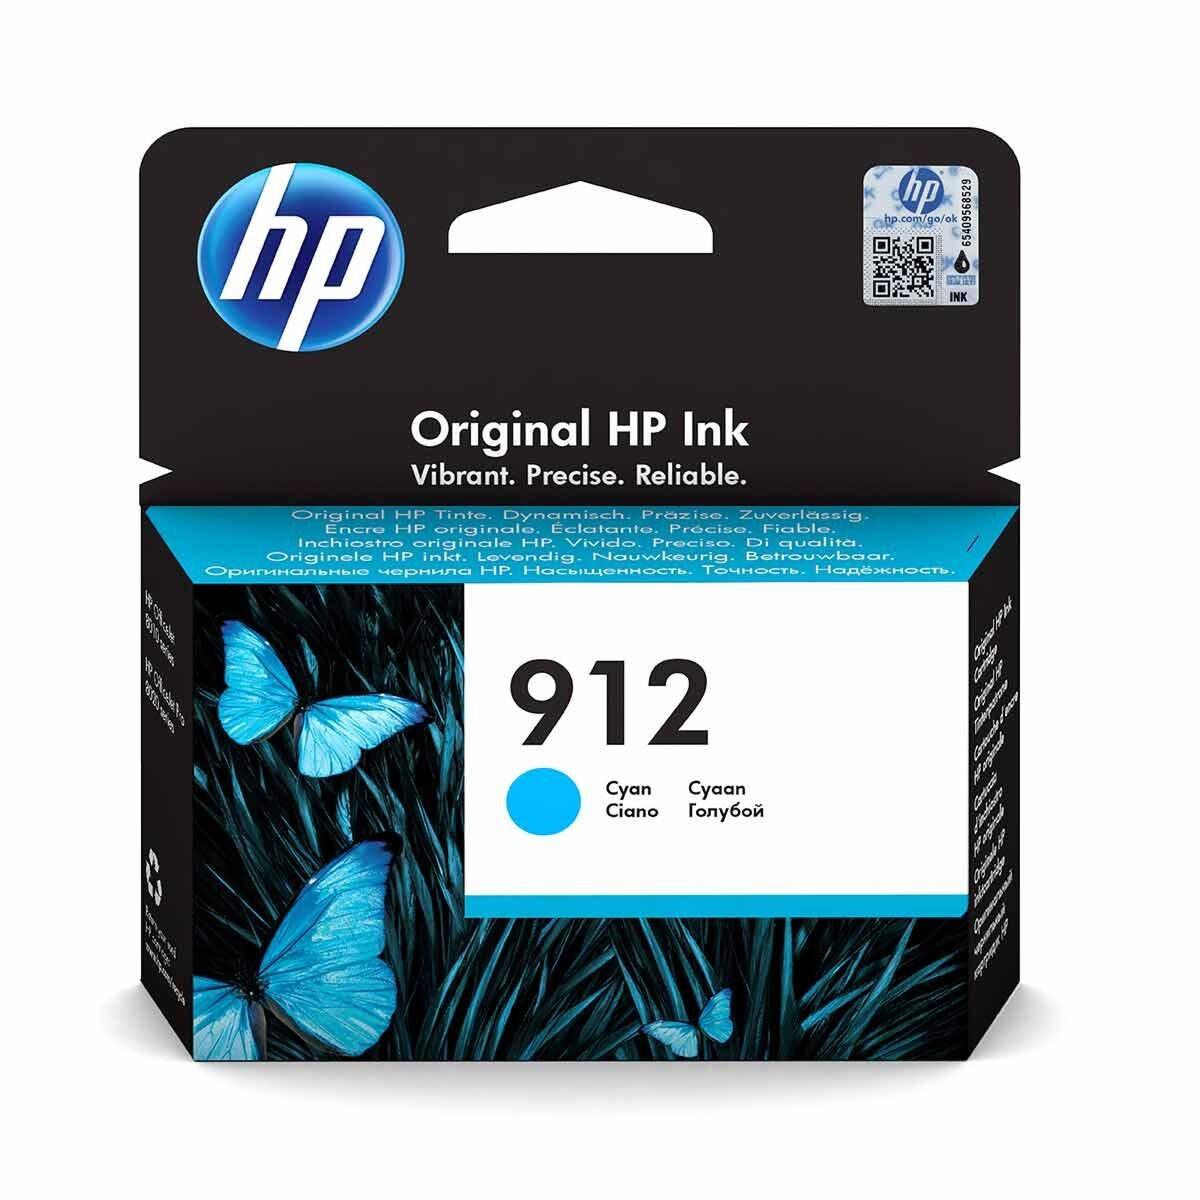 HP 912 Cyan Original Ink Cartridge